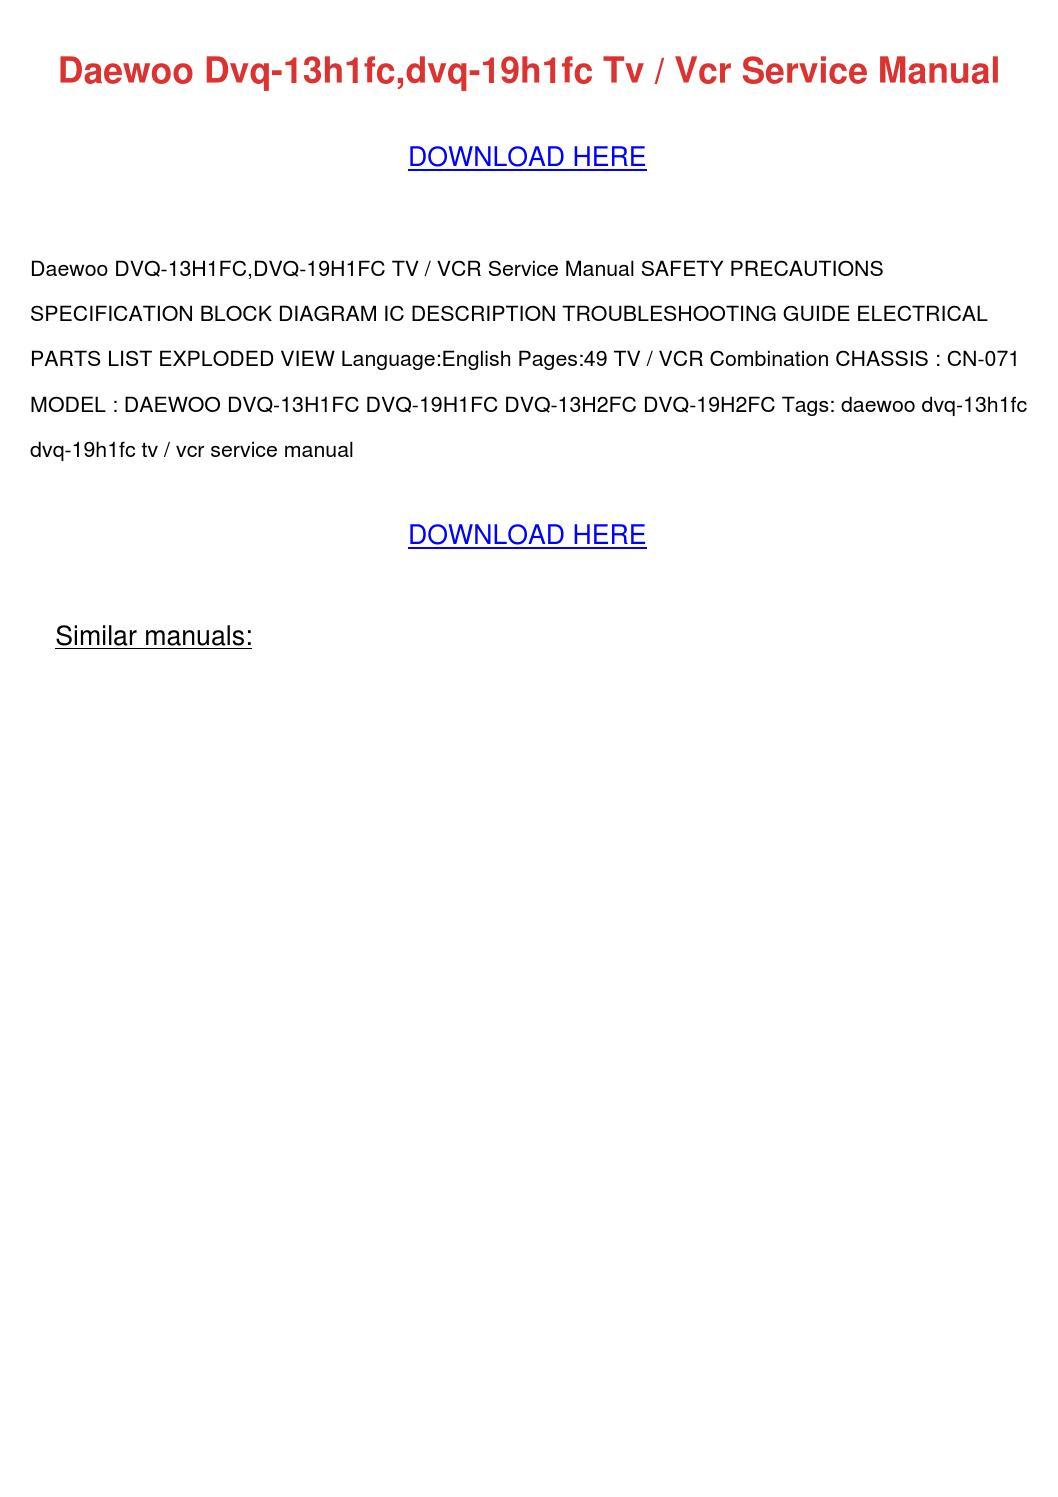 Daewoo Dvq 13h1fcn Tv Vcr Workshop Service Repair